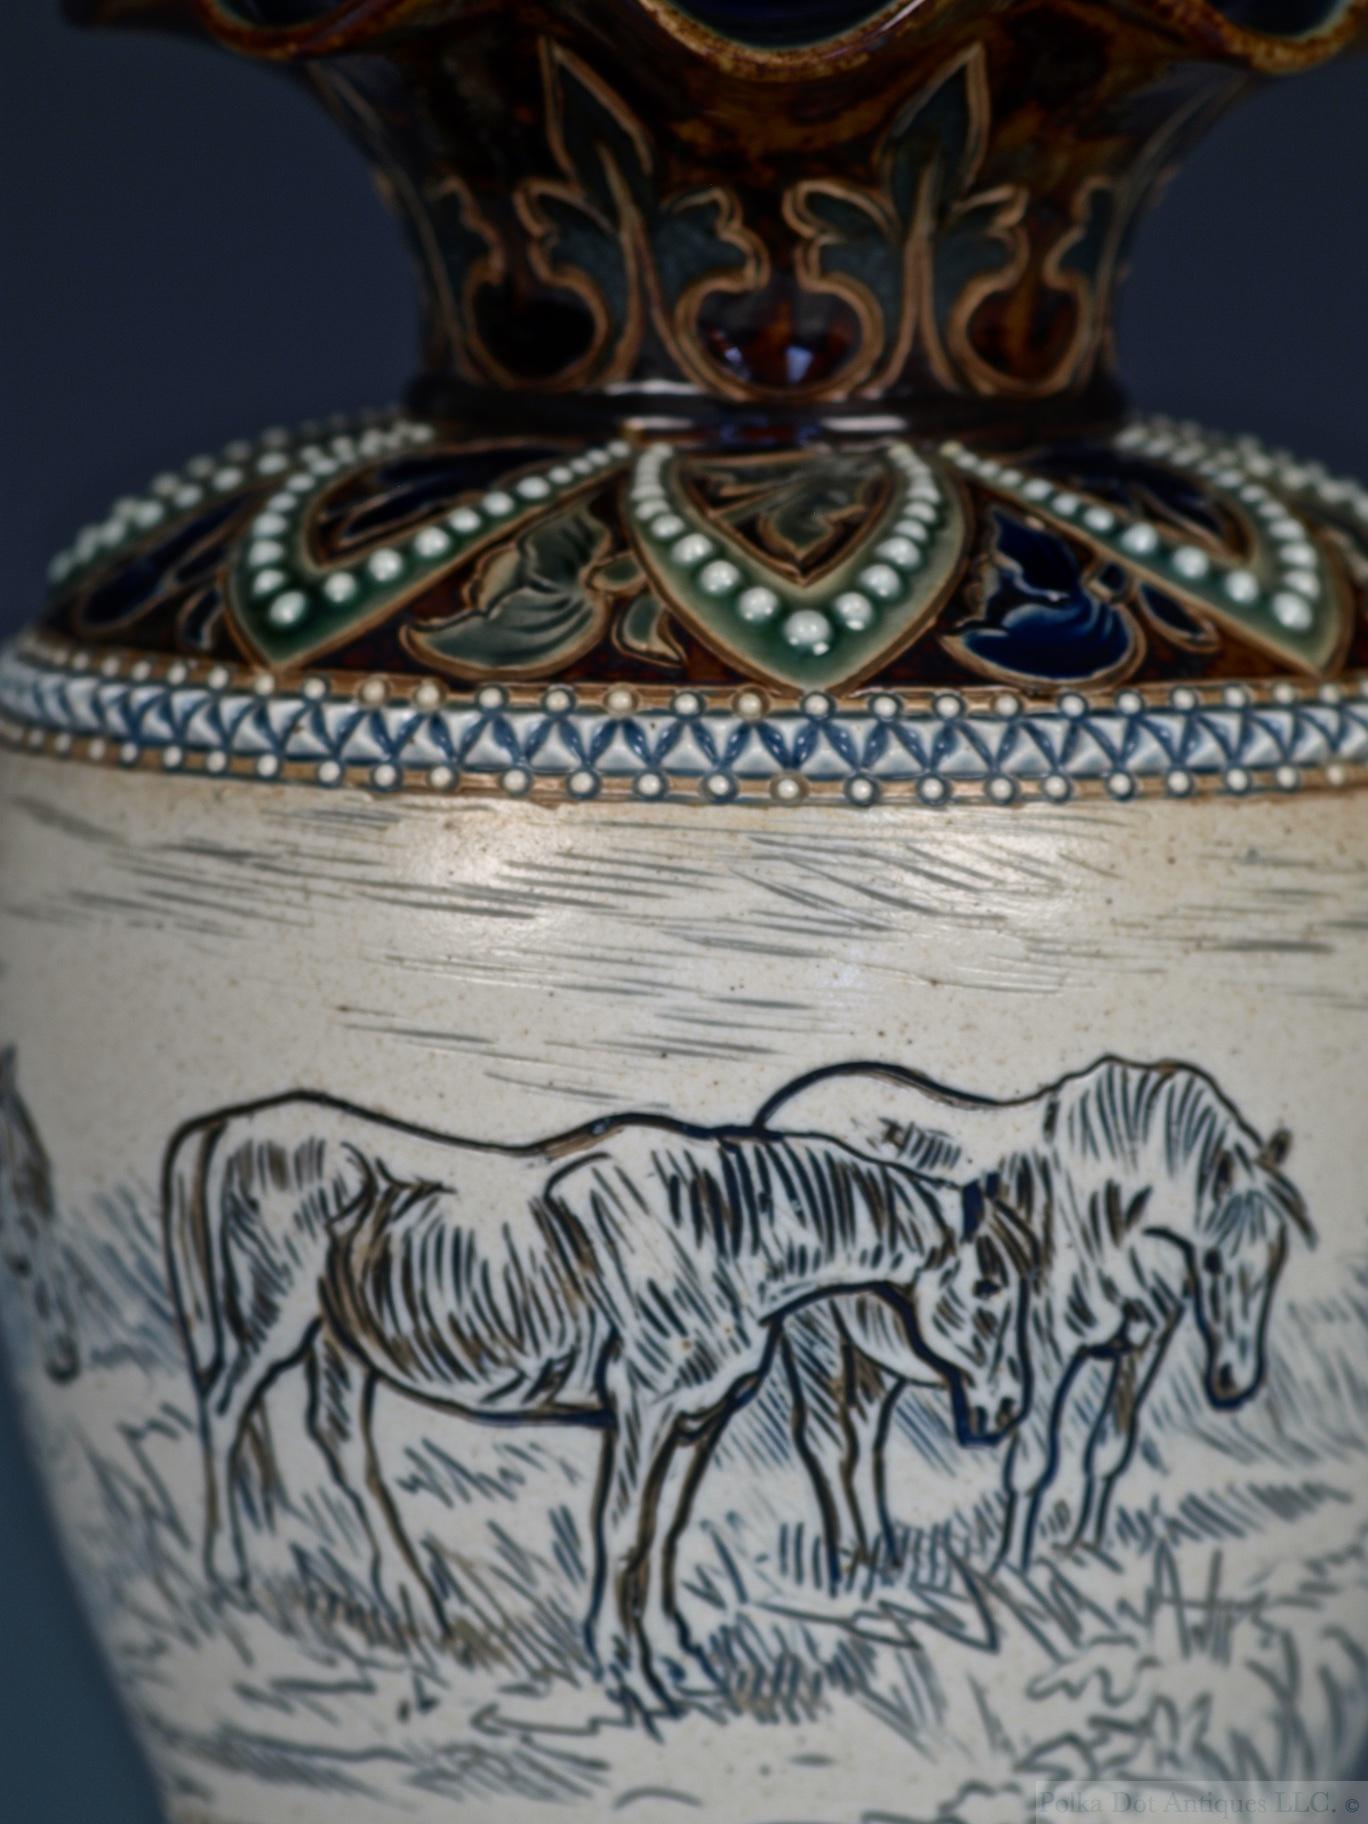 rpw357 Doulton Horse vase - 5.jpg